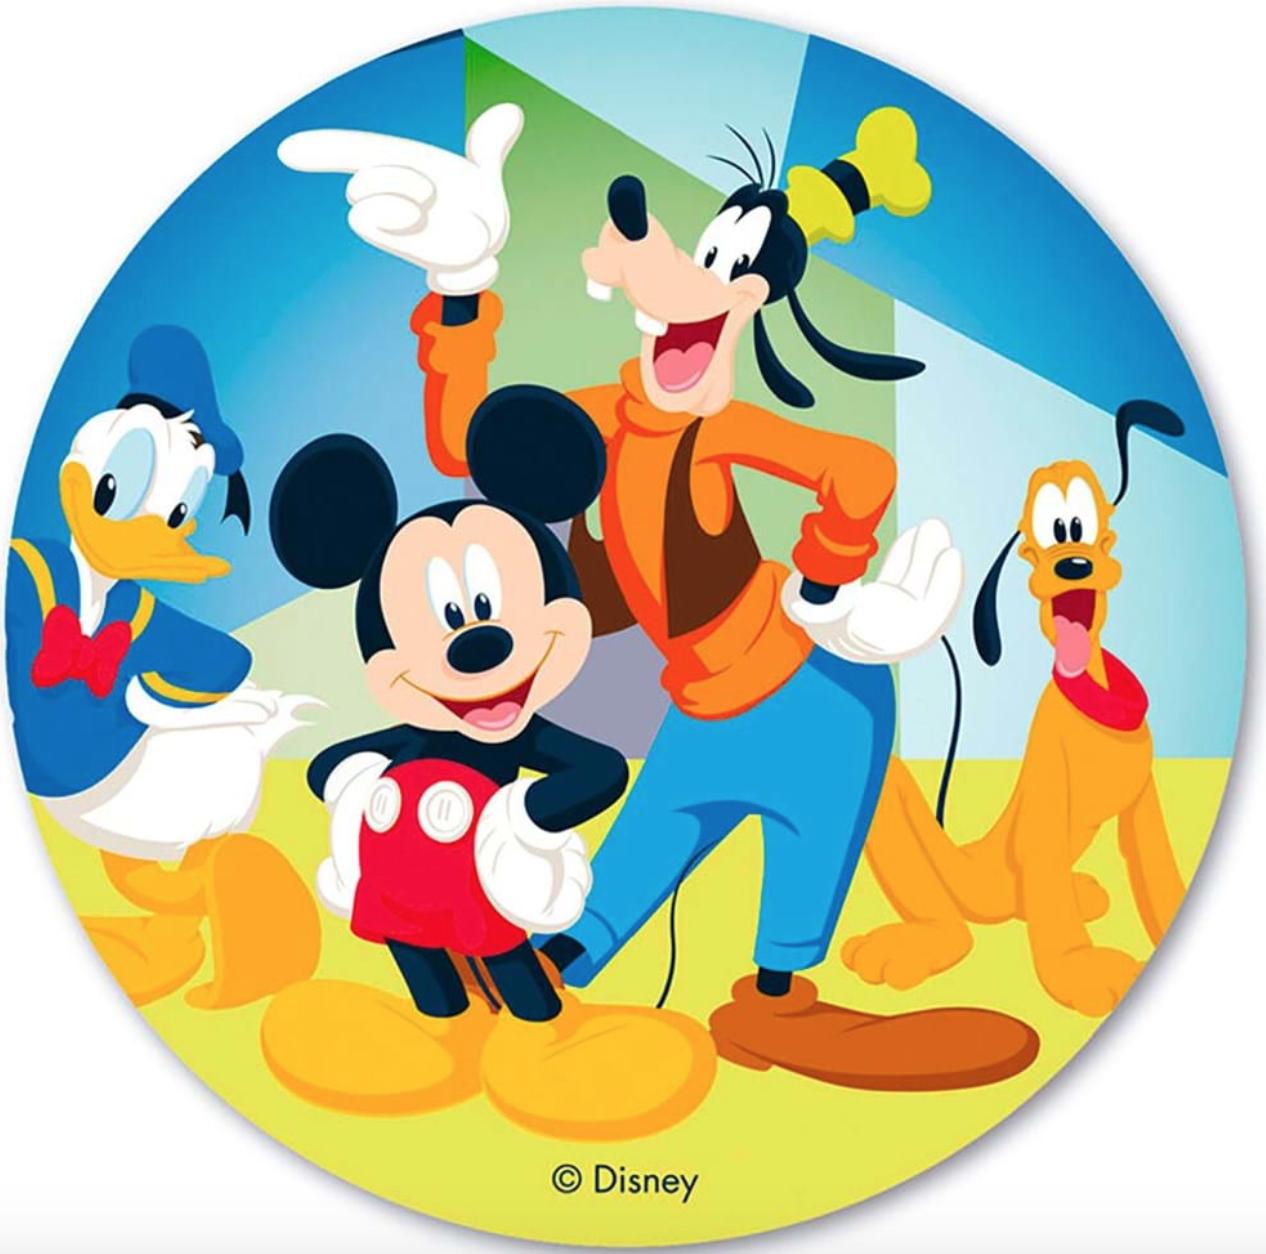 disney kageprint - Mickey Mouse kageprint